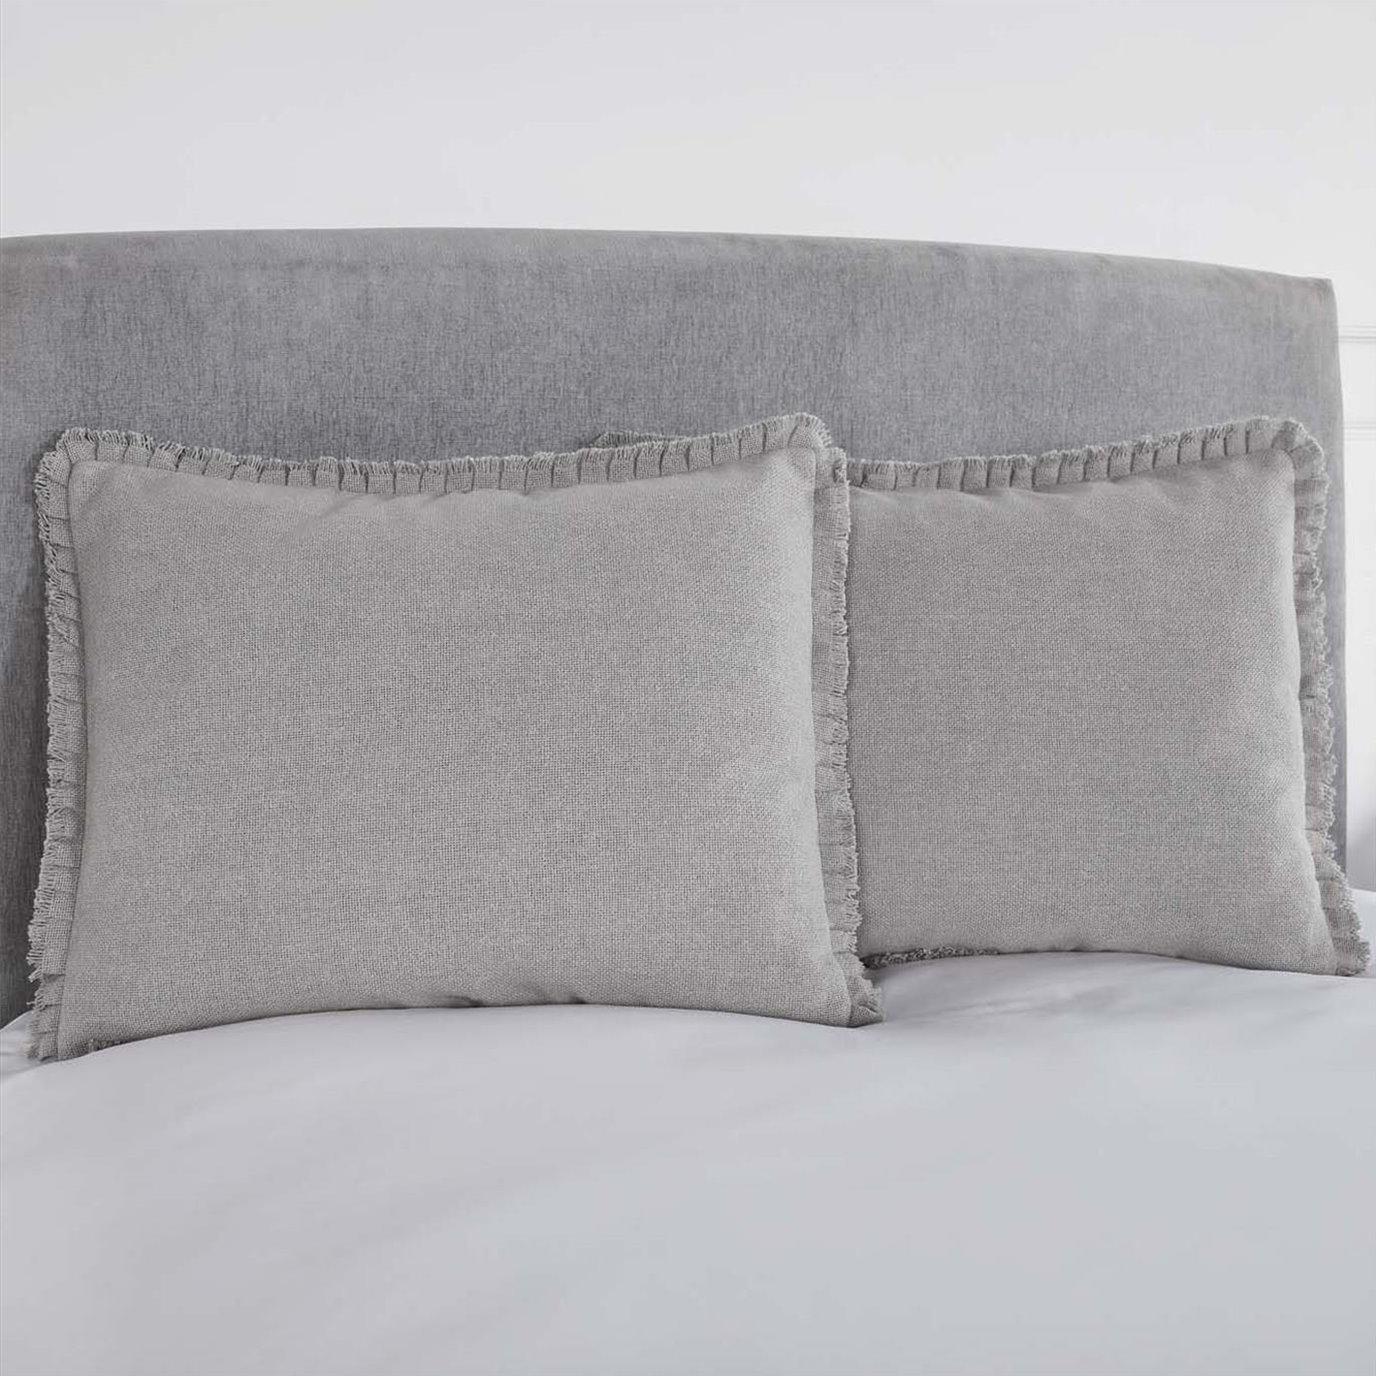 Burlap Dove Grey Standard Sham w/ Fringed Ruffle 21x27